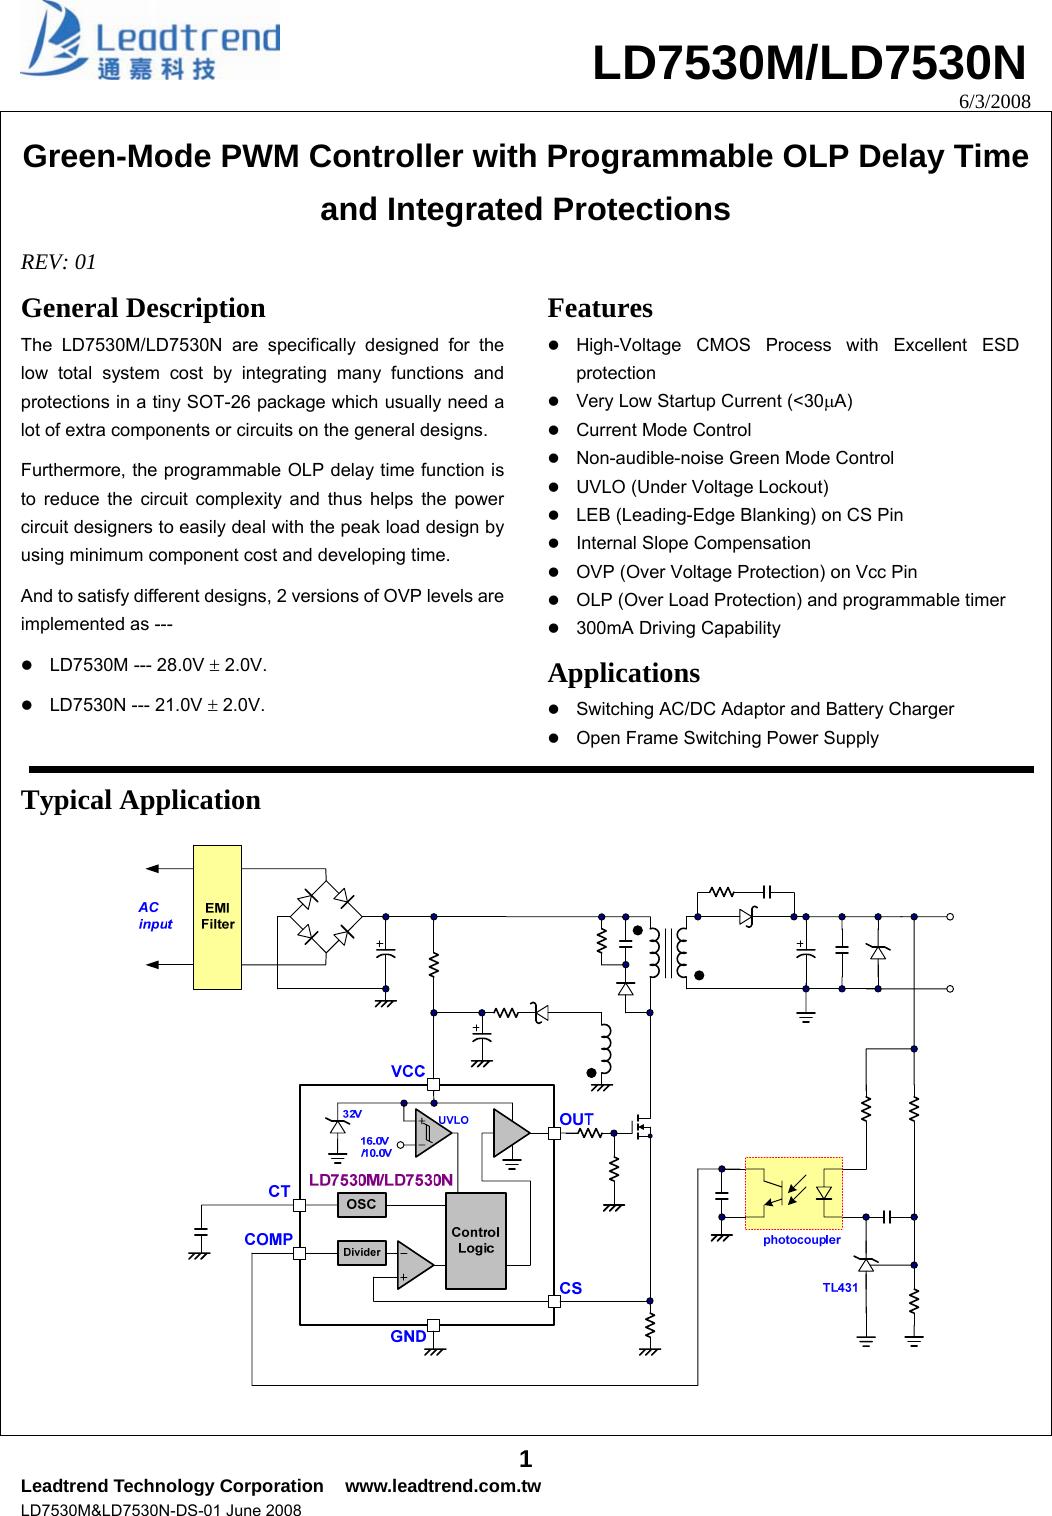 Ld7530m Ld7530n Datasheet S Manualscom Leadtrend Undervoltage Lockout Circuit